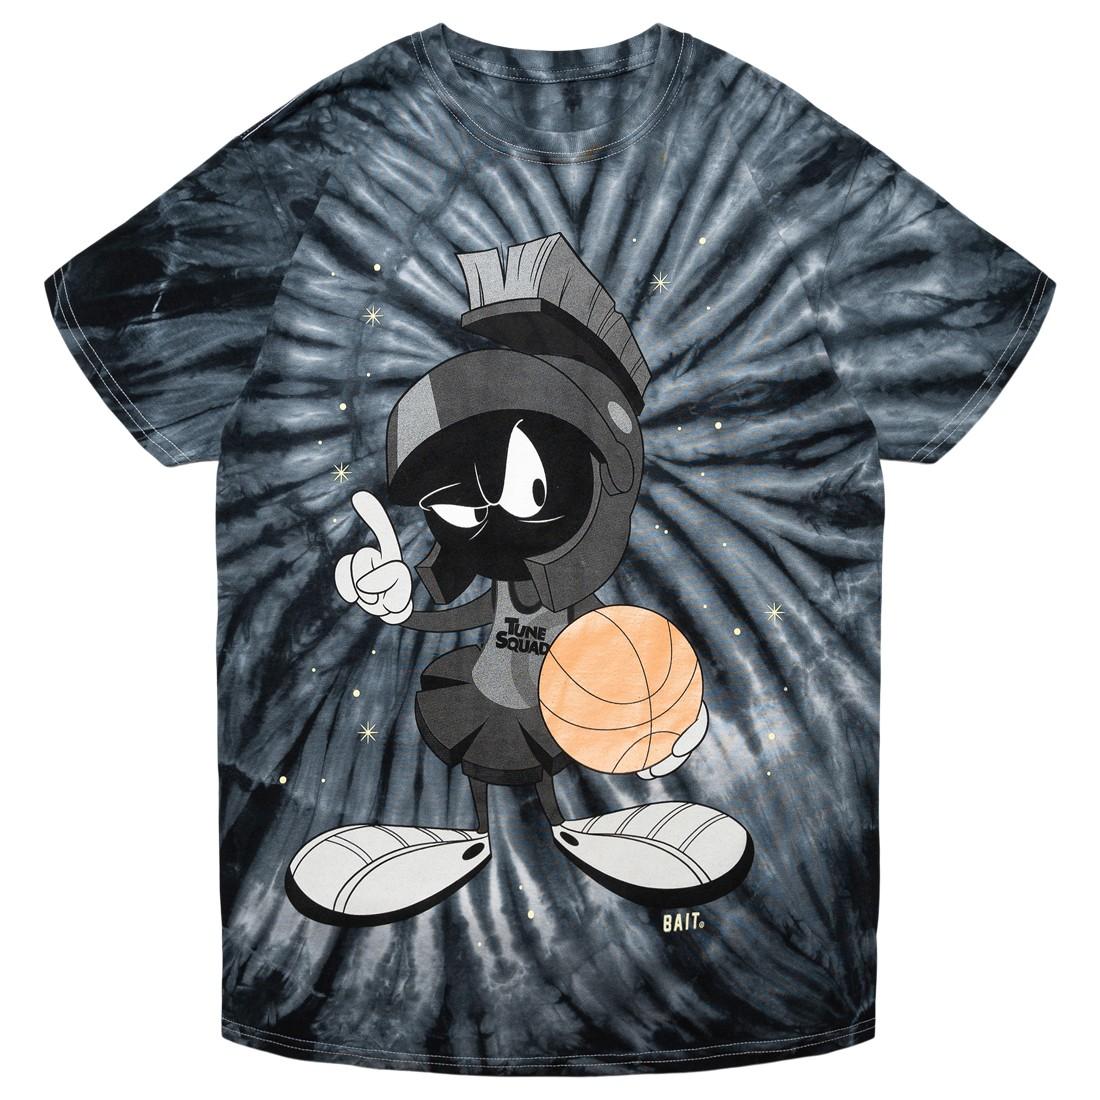 BAIT x Space Jam A New Legacy Men Marvin Legacy Tee (black / tie dye)